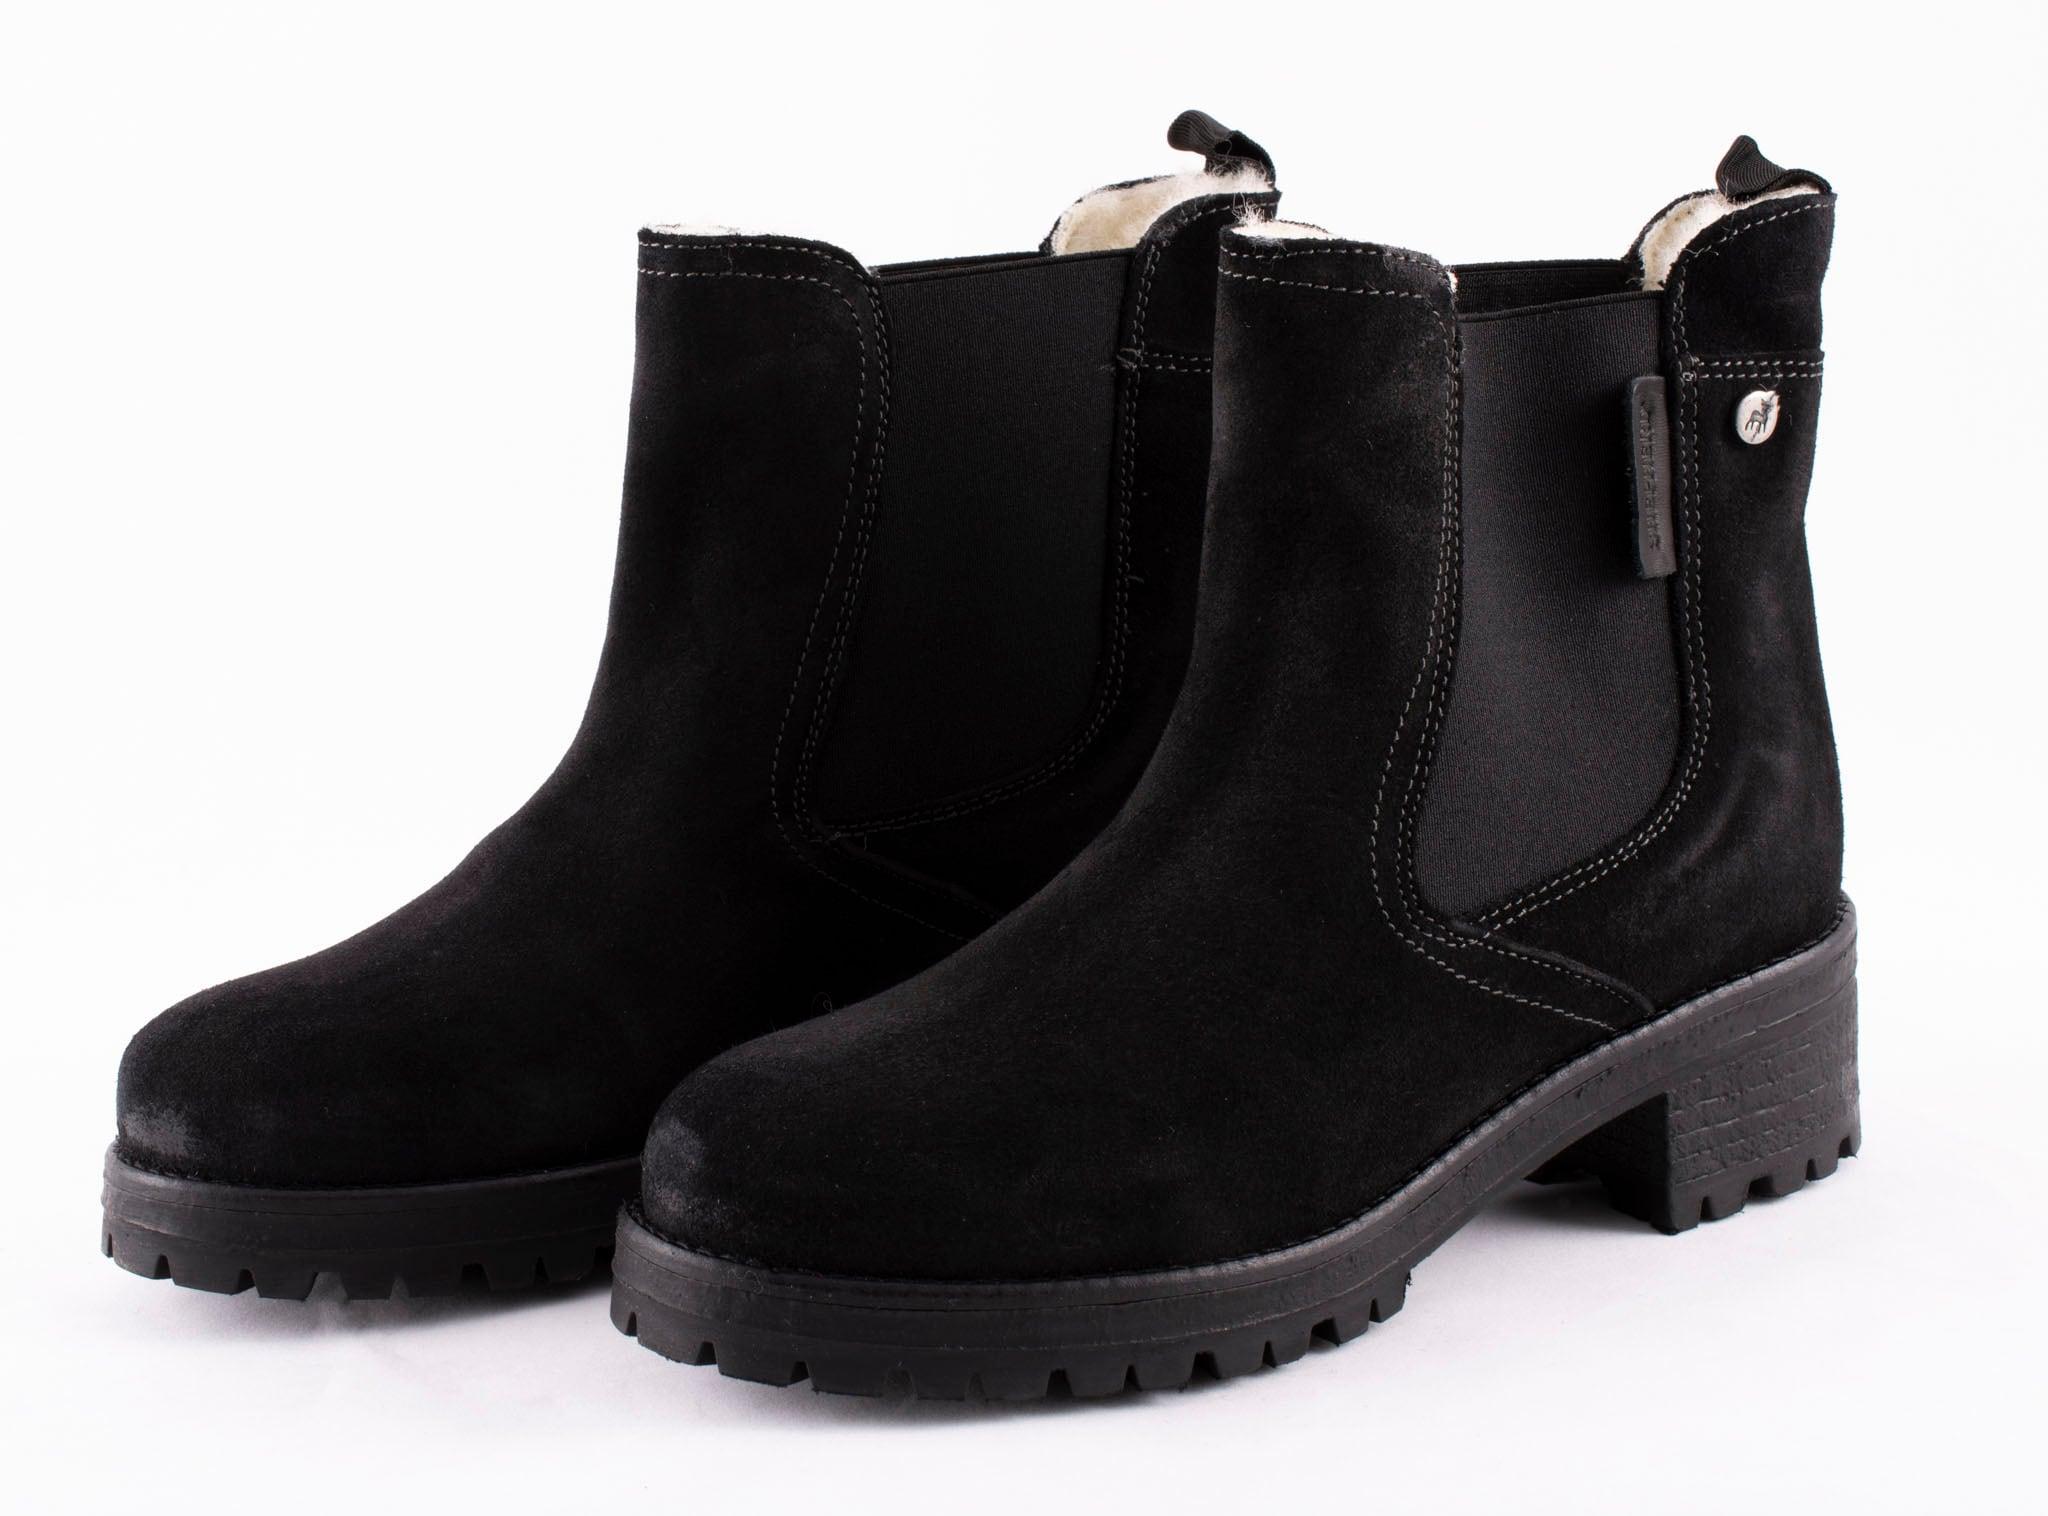 Lotta, Chelsea boots in suede Black